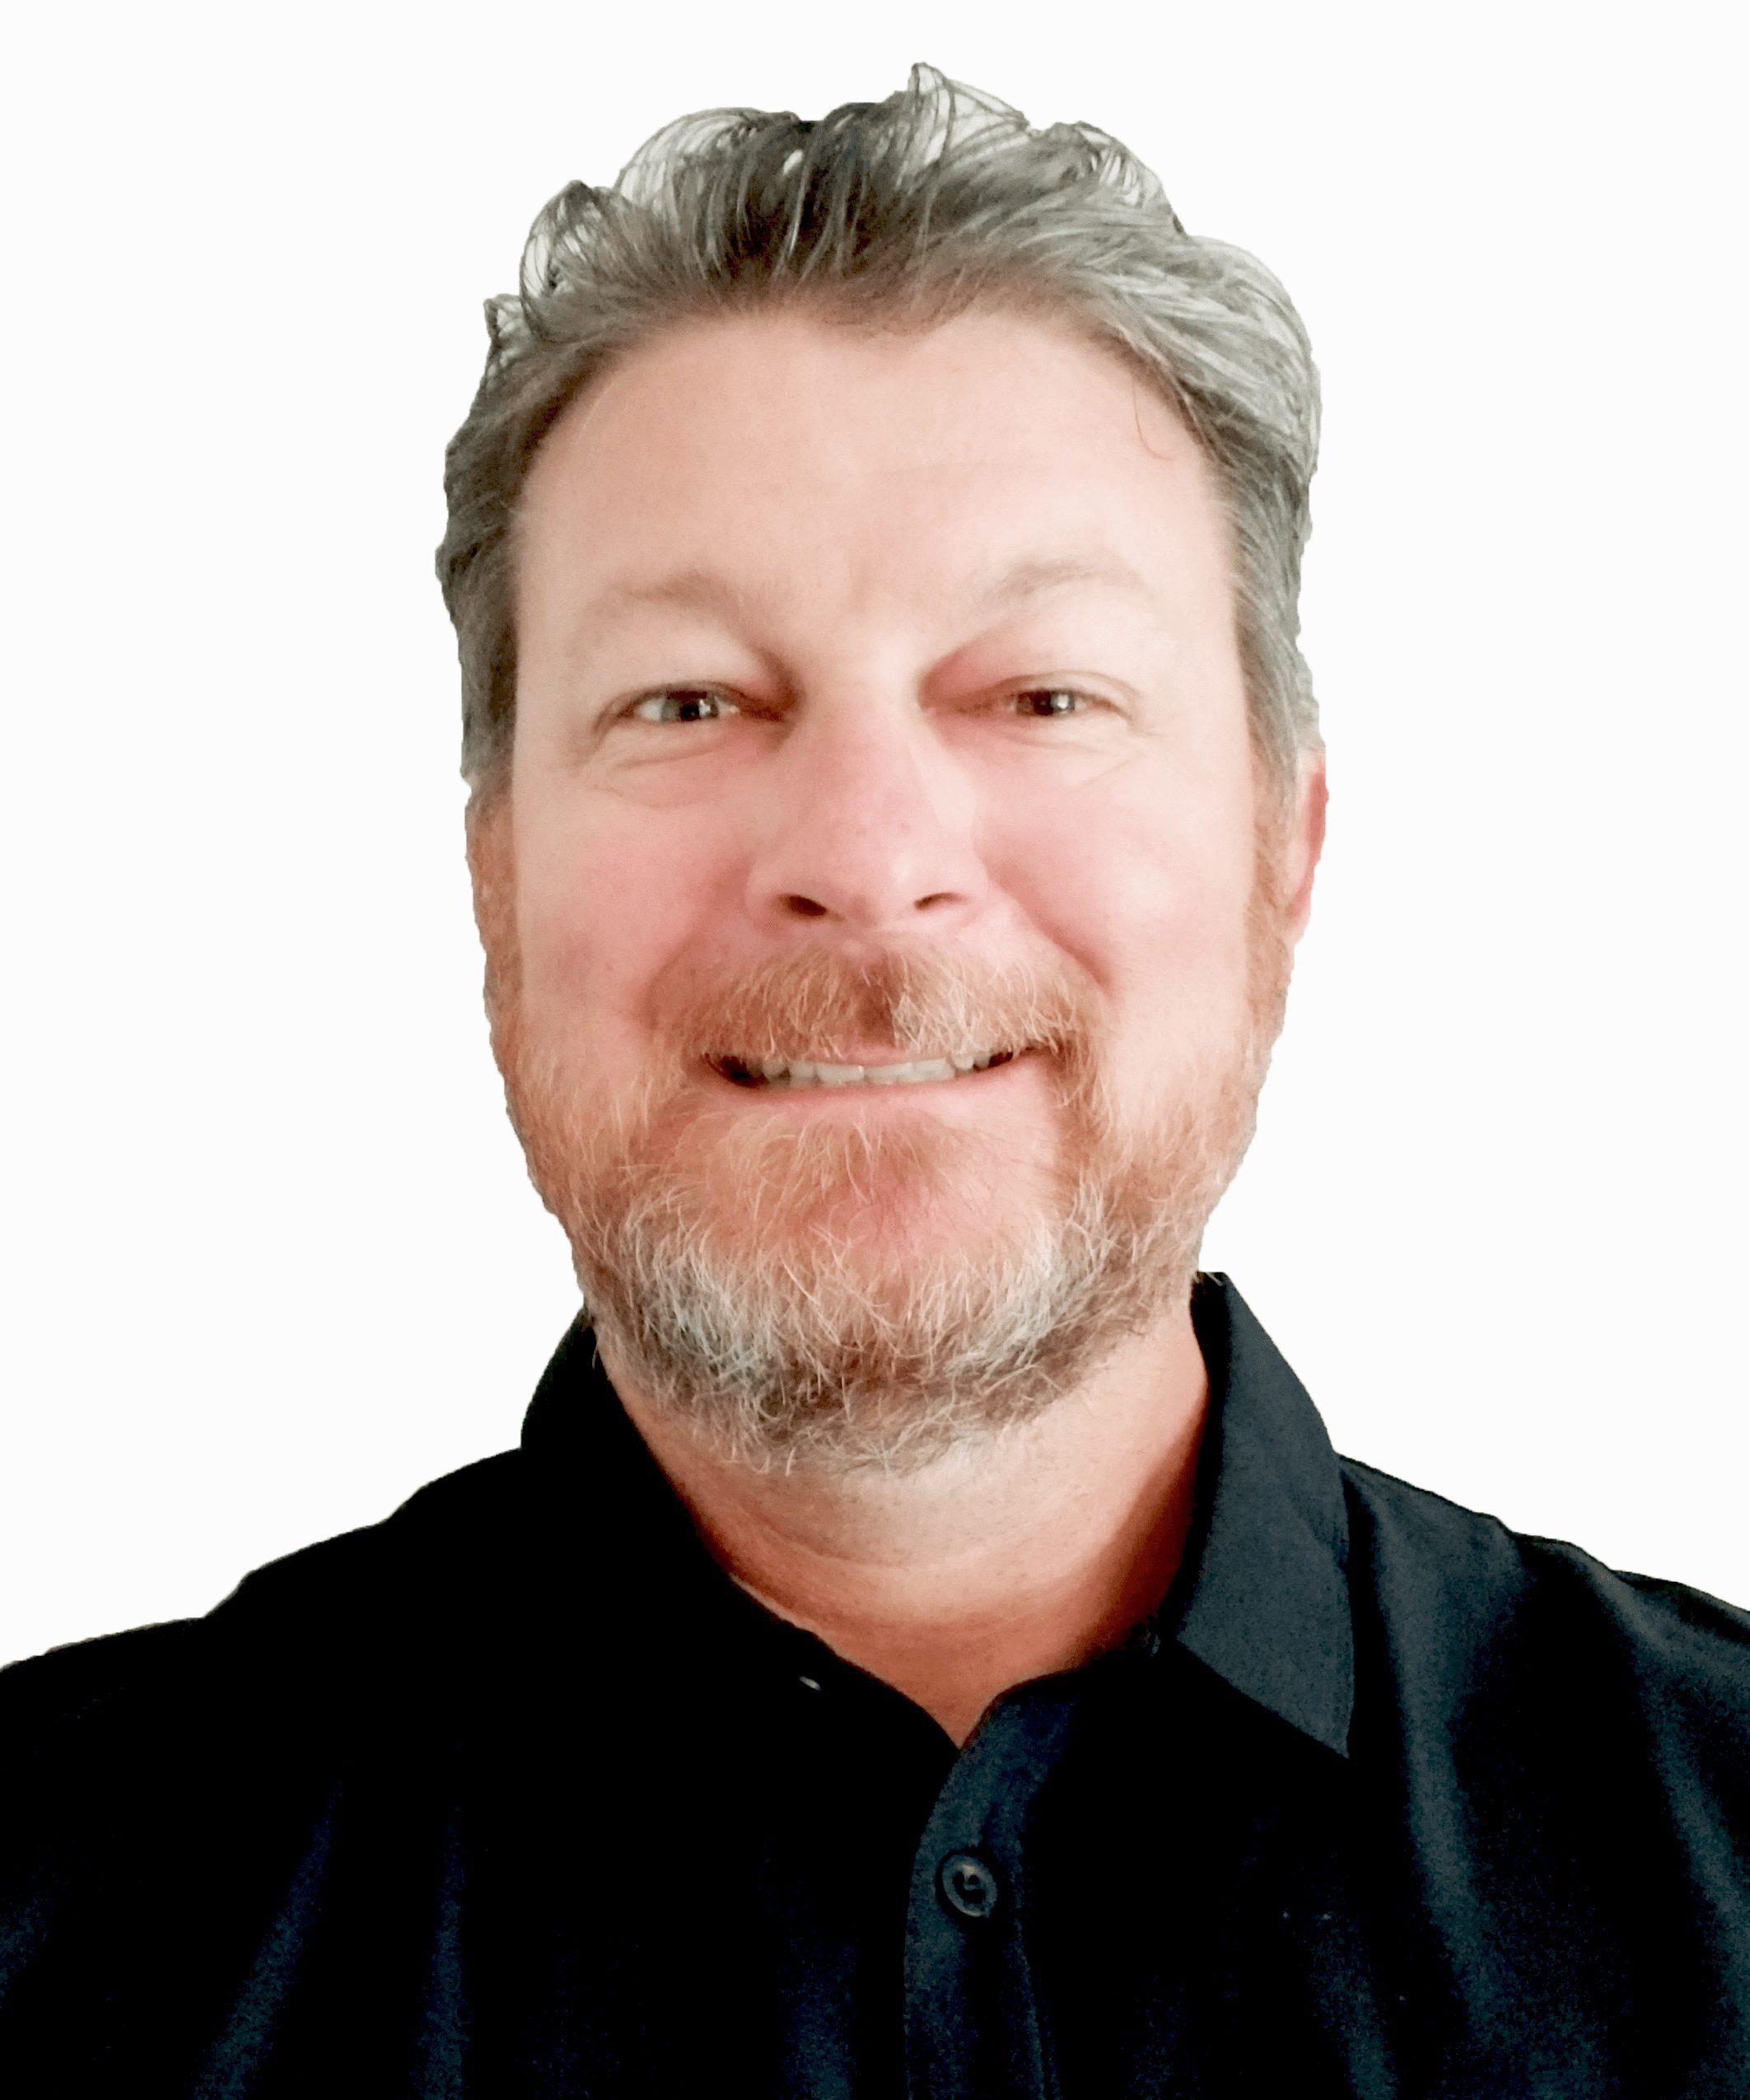 Eric Smith, Strategic Account Manager